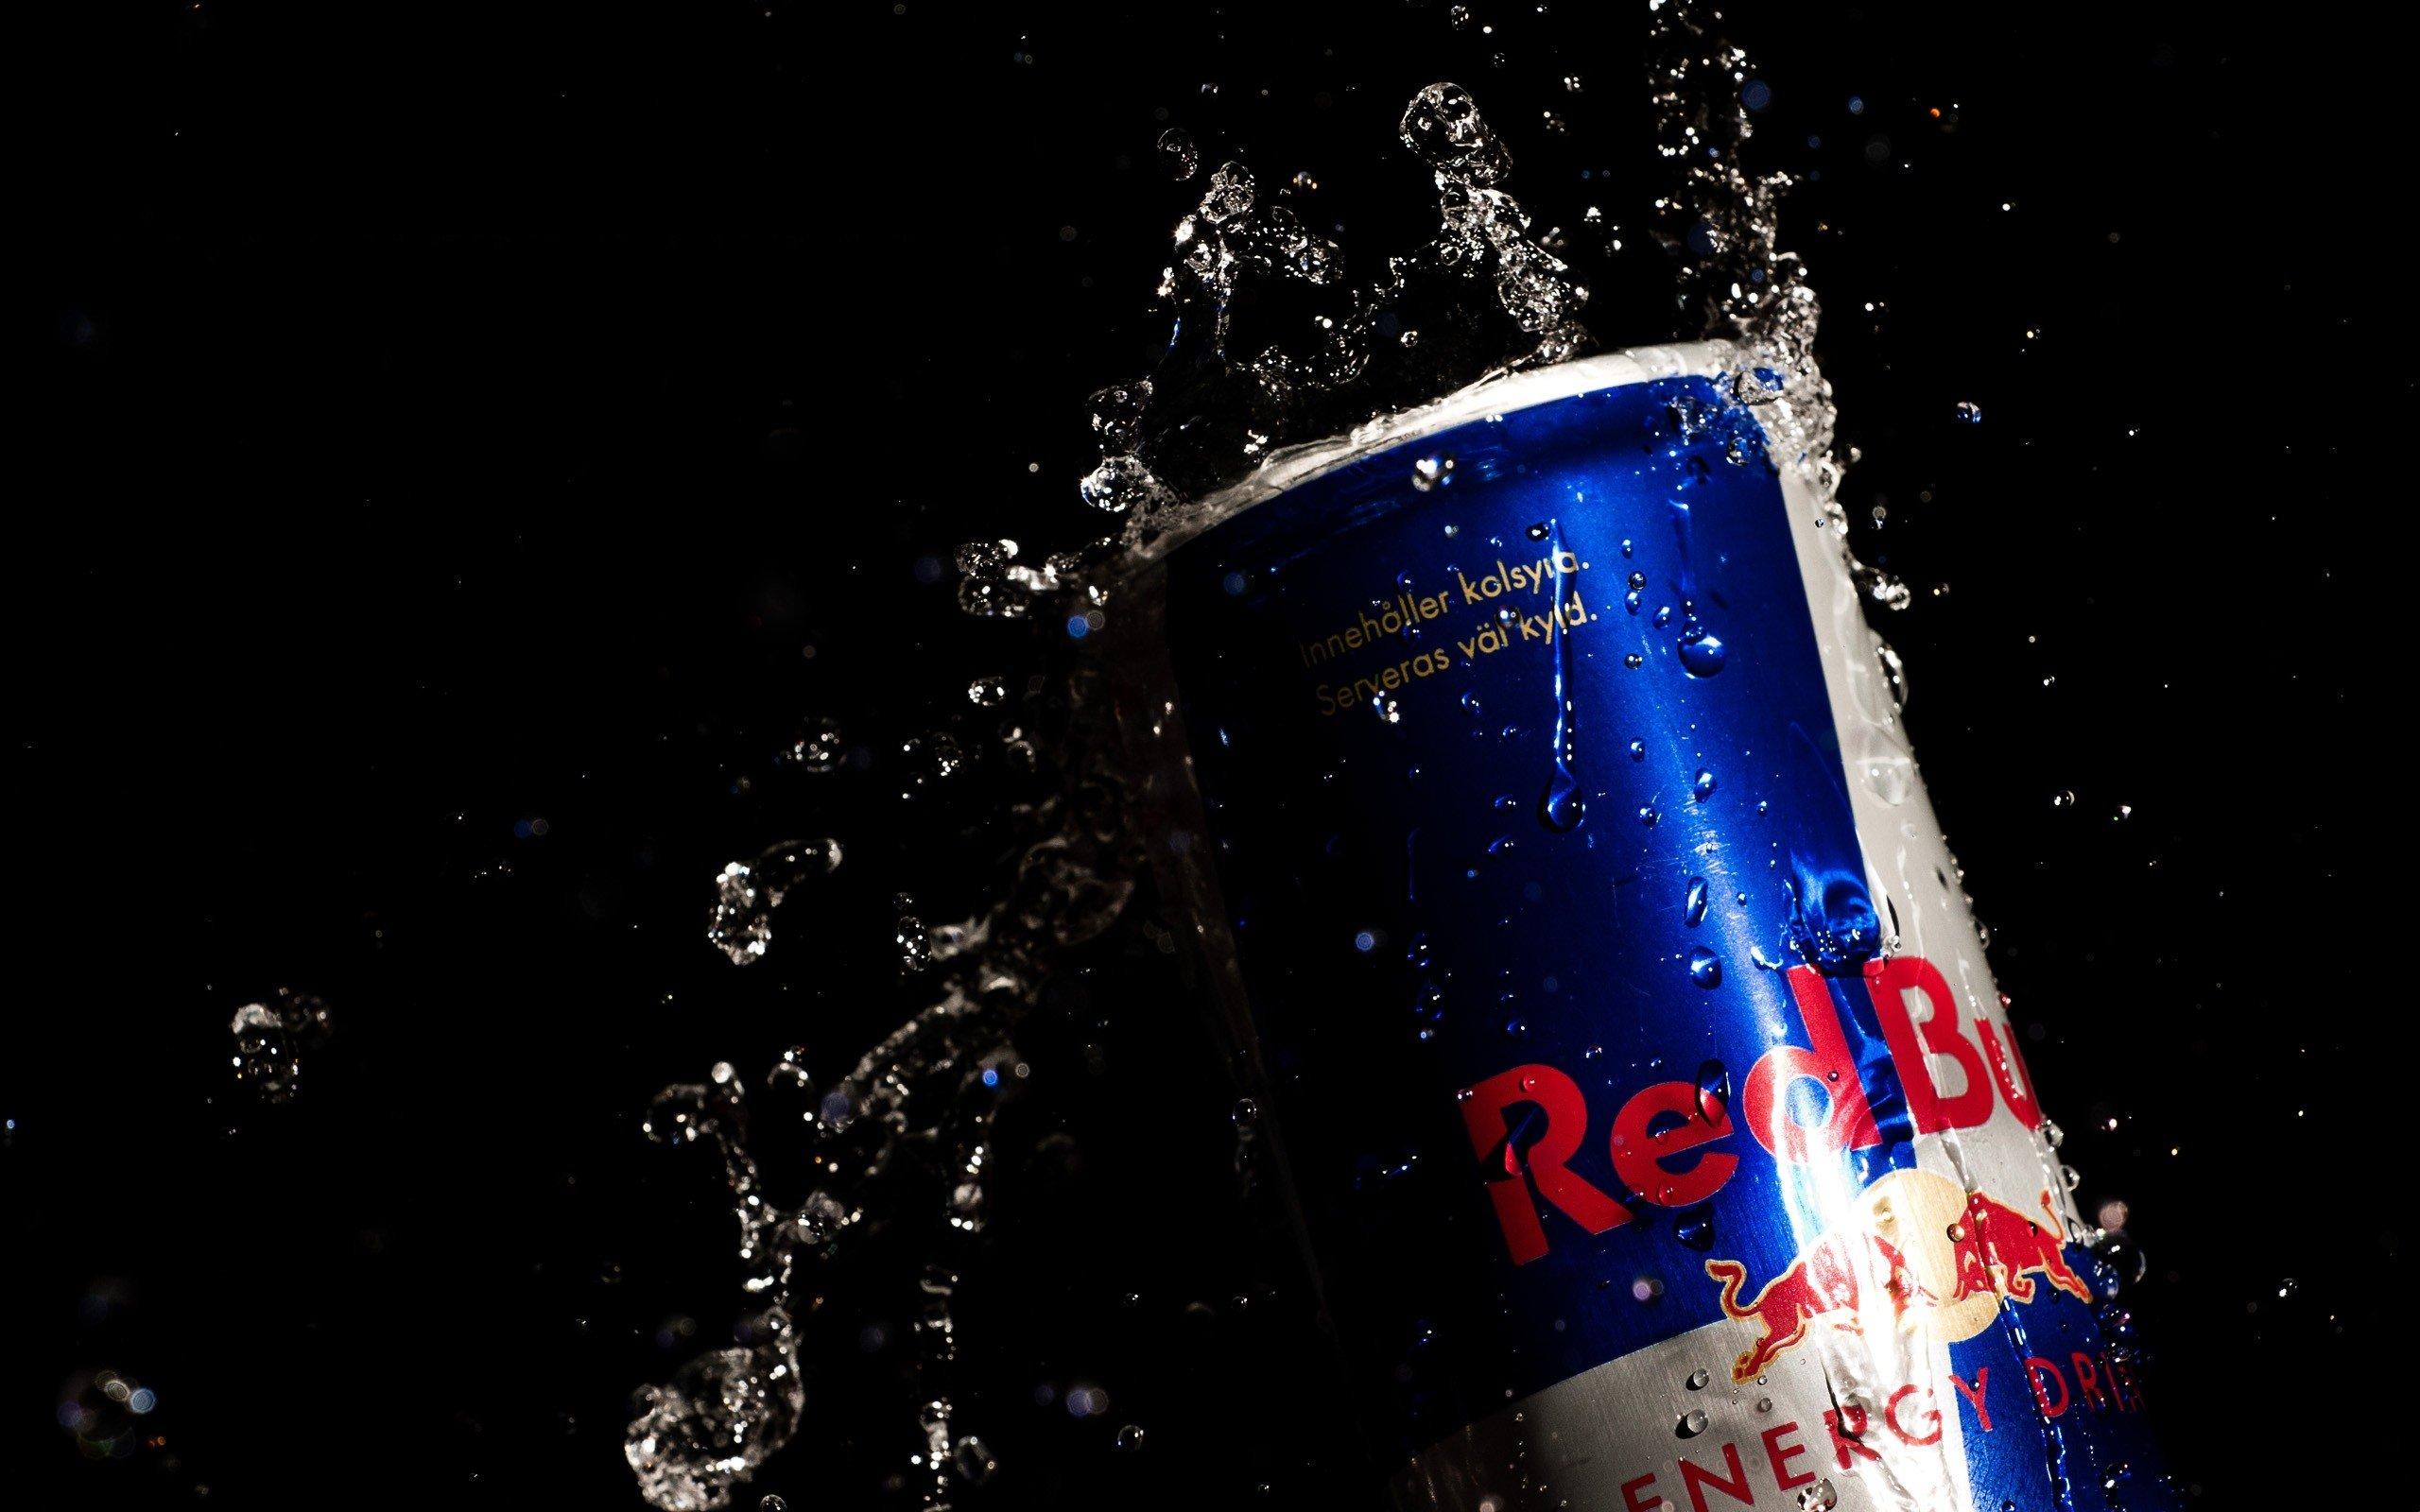 brand, Red Bull HD Wallpapers / Desktop